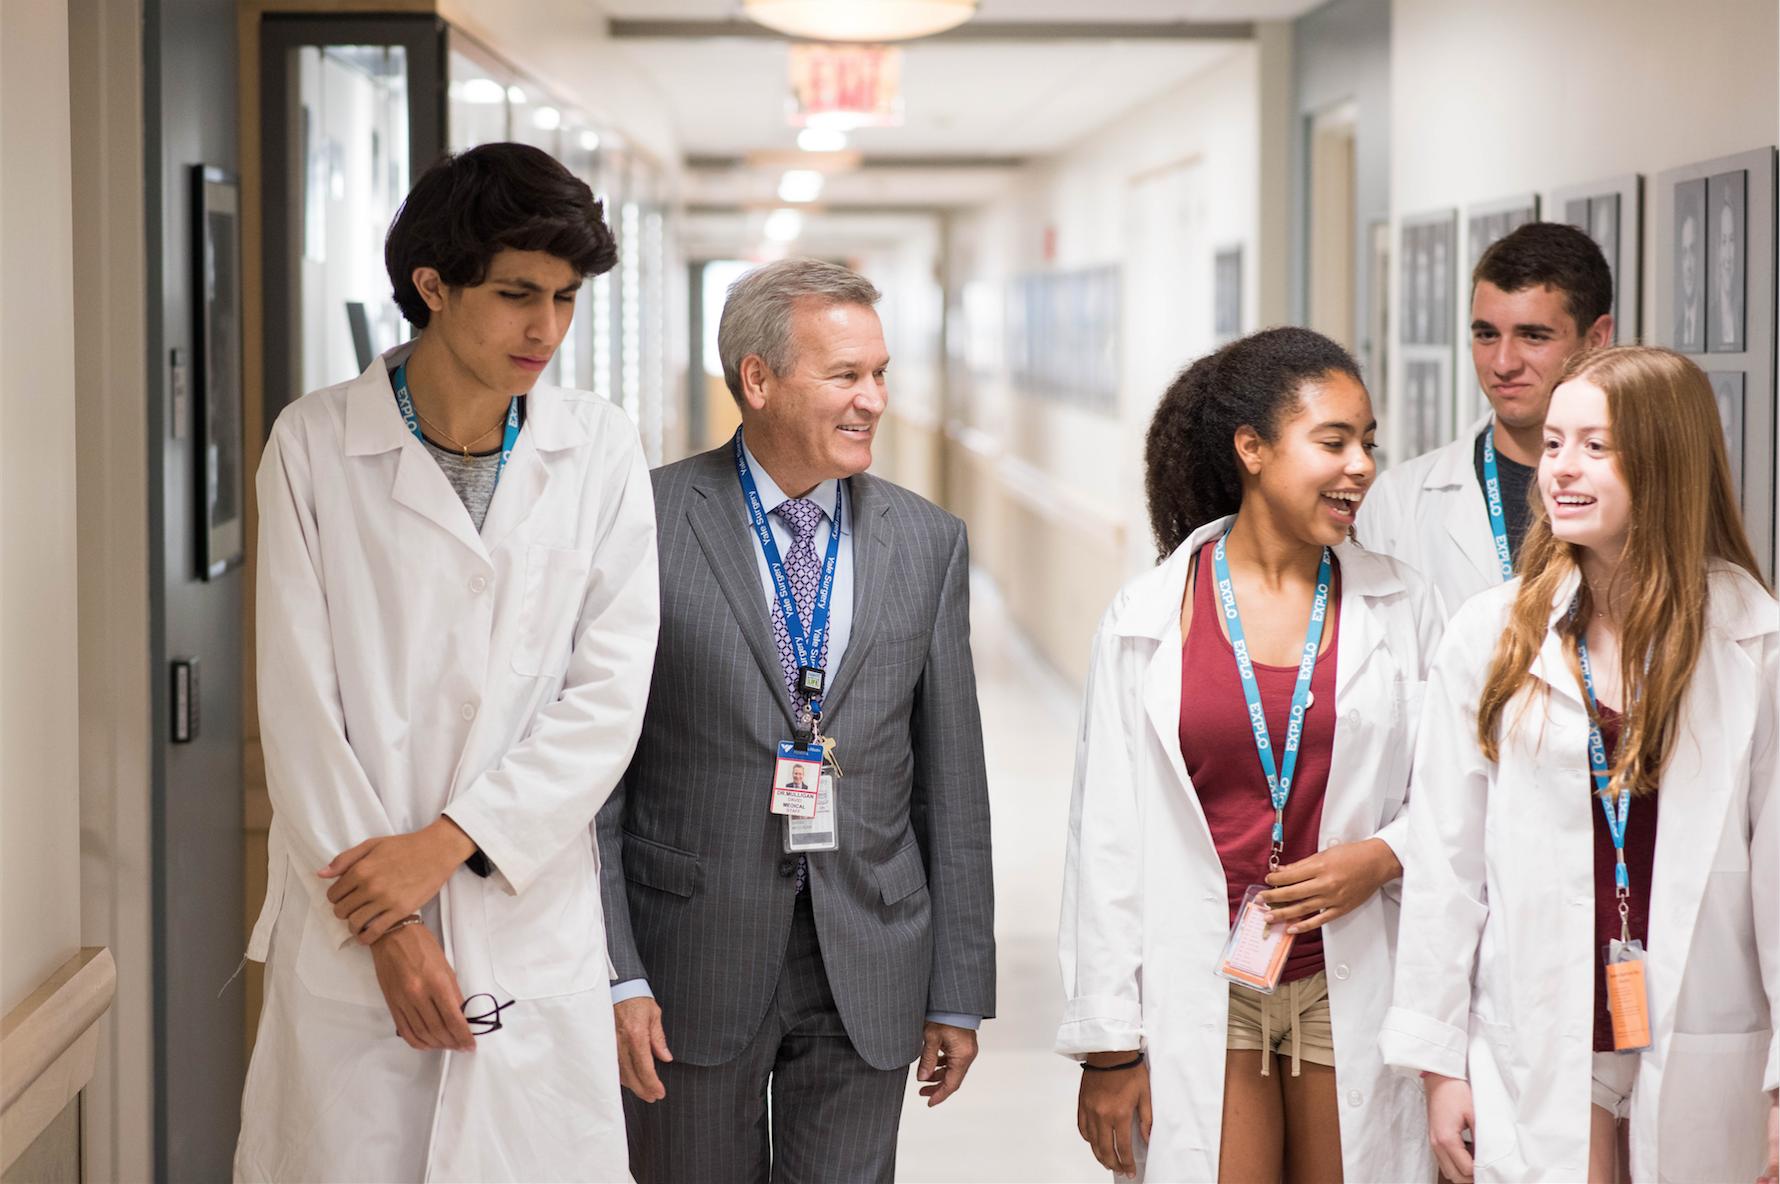 The Future of Medicine is at EXPLO: International Leader in Transplantation and Immunology David Mulligan, M.D.